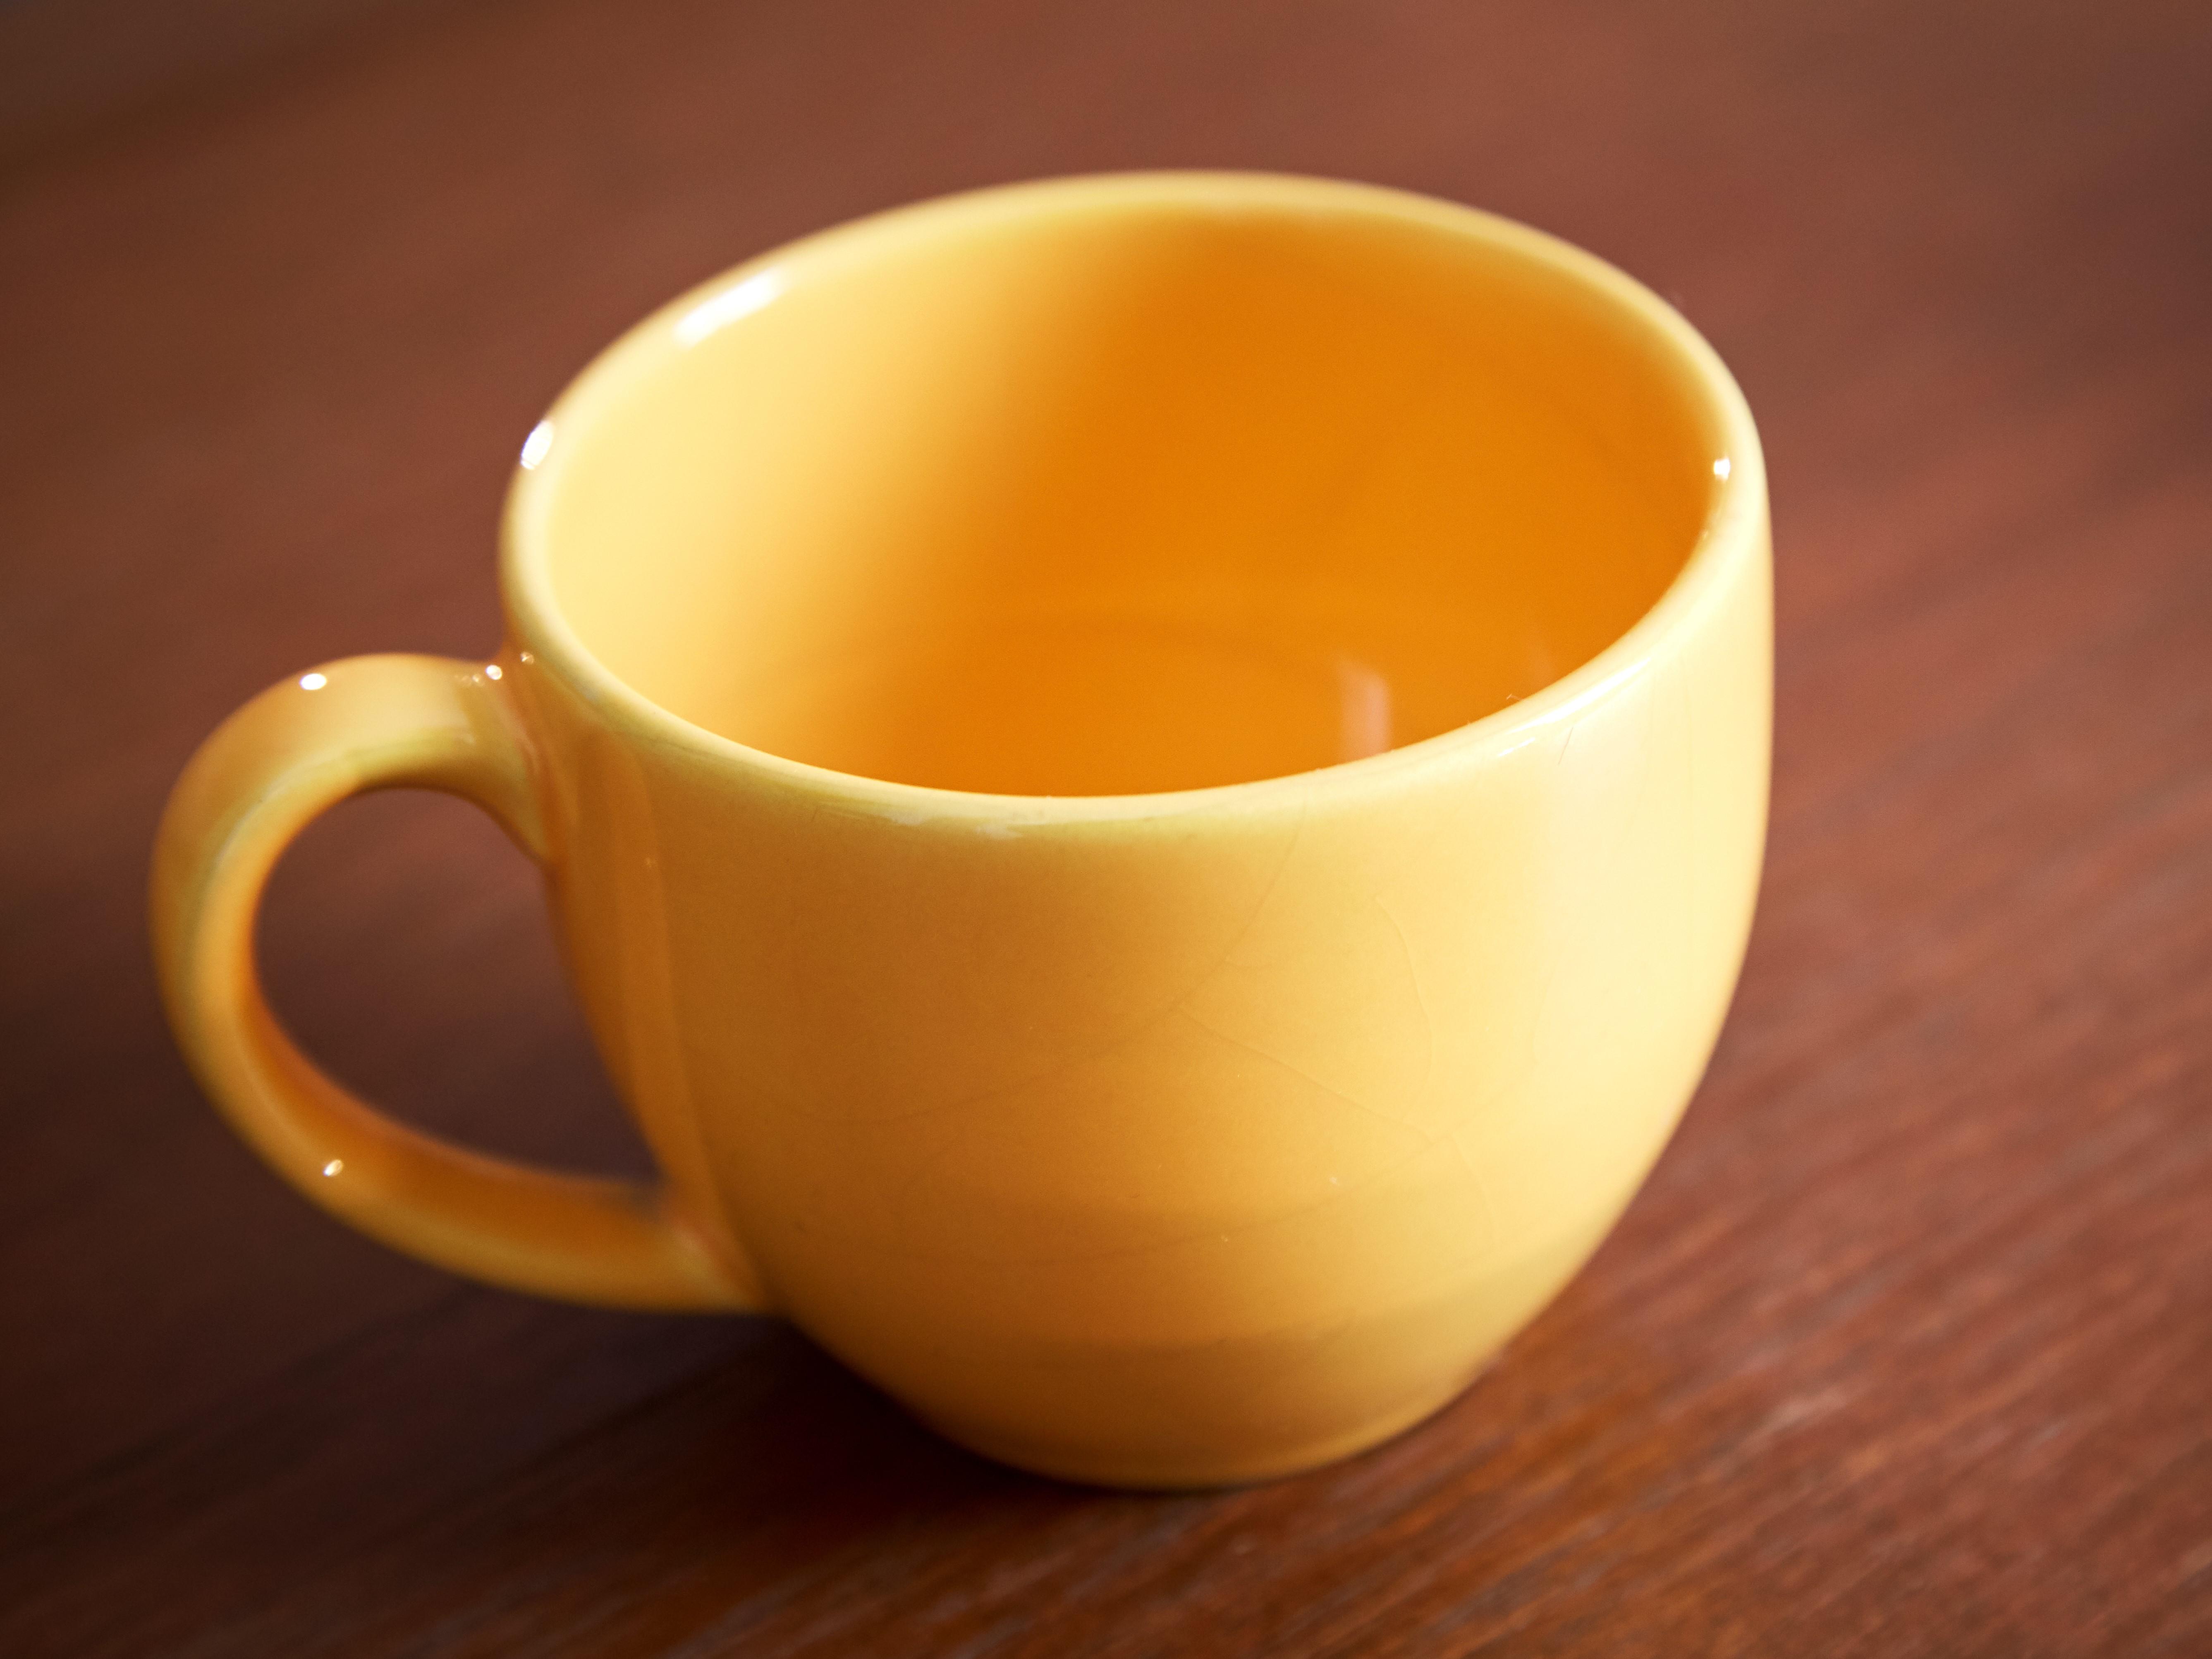 yellow ceramic mug on wood surface